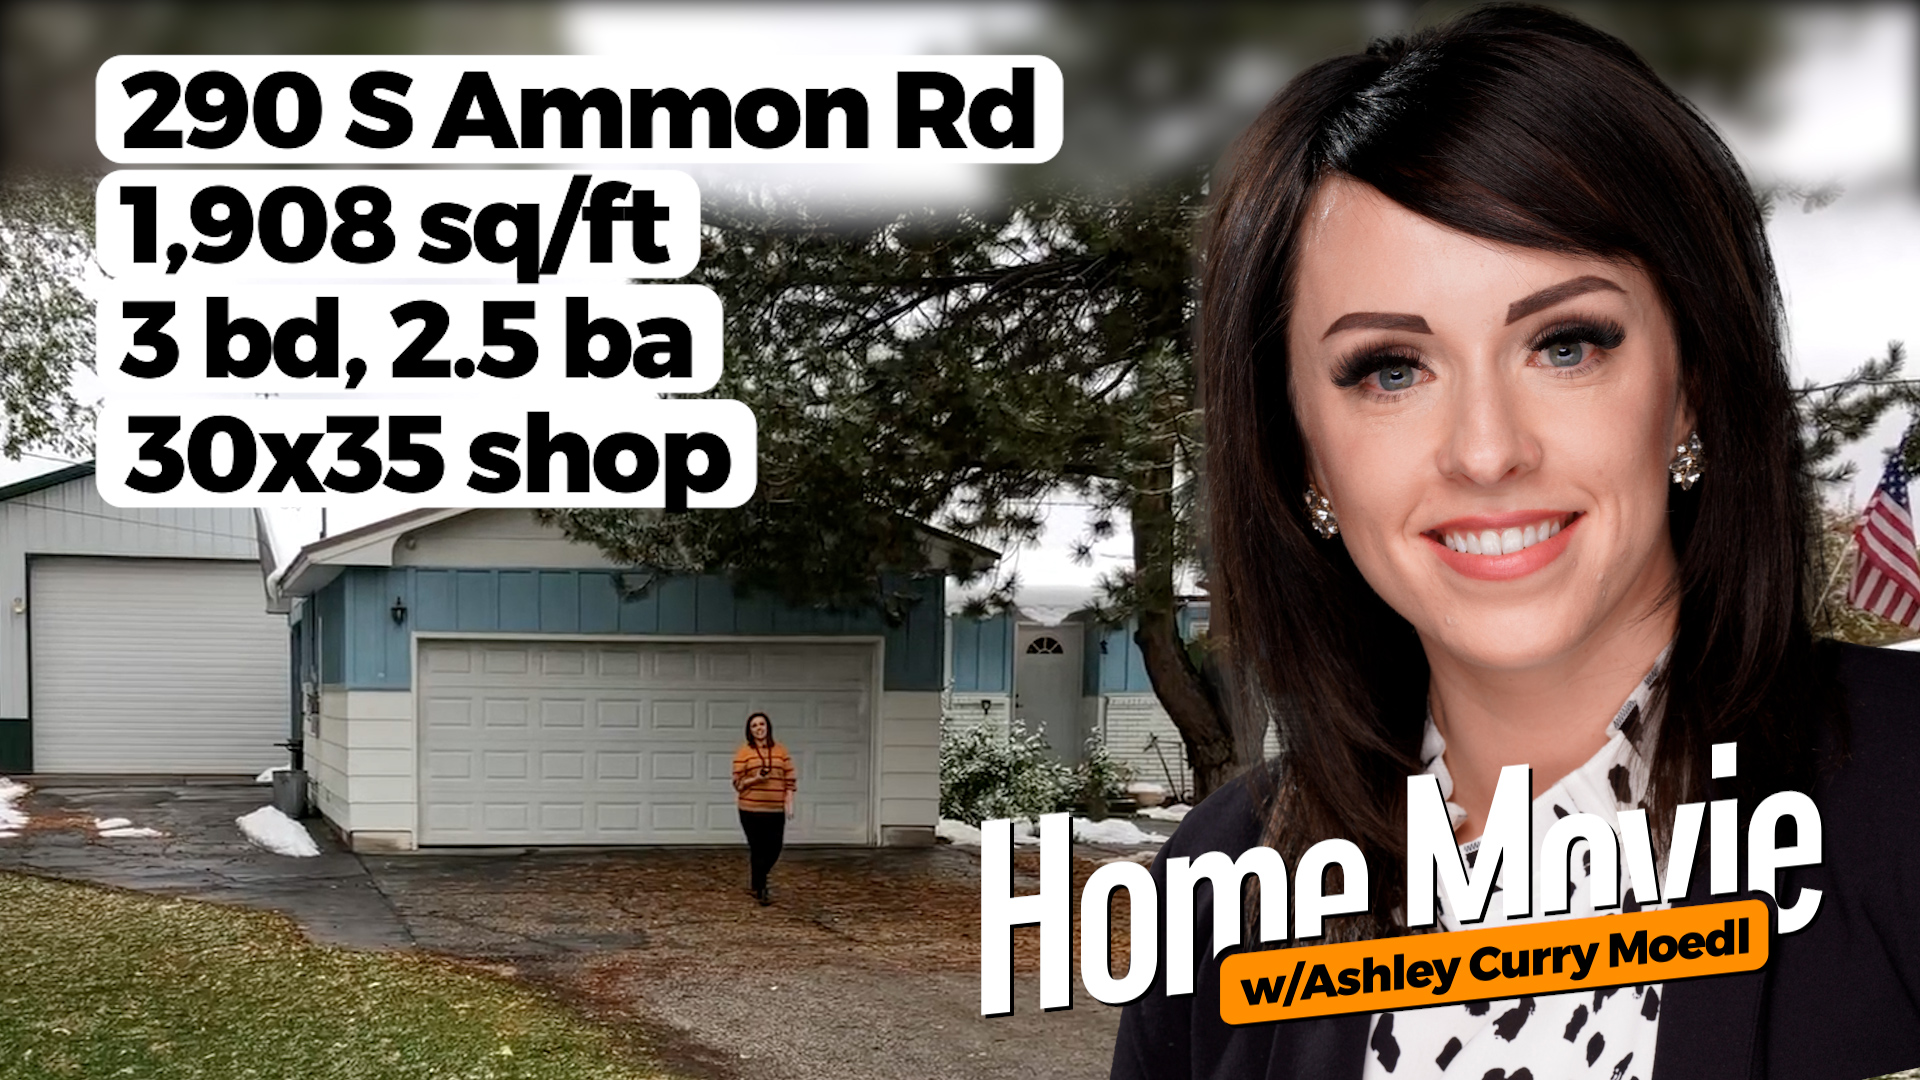 NEW TO THE MARKET! 290 S Ammon Road in Ammon, Idaho!